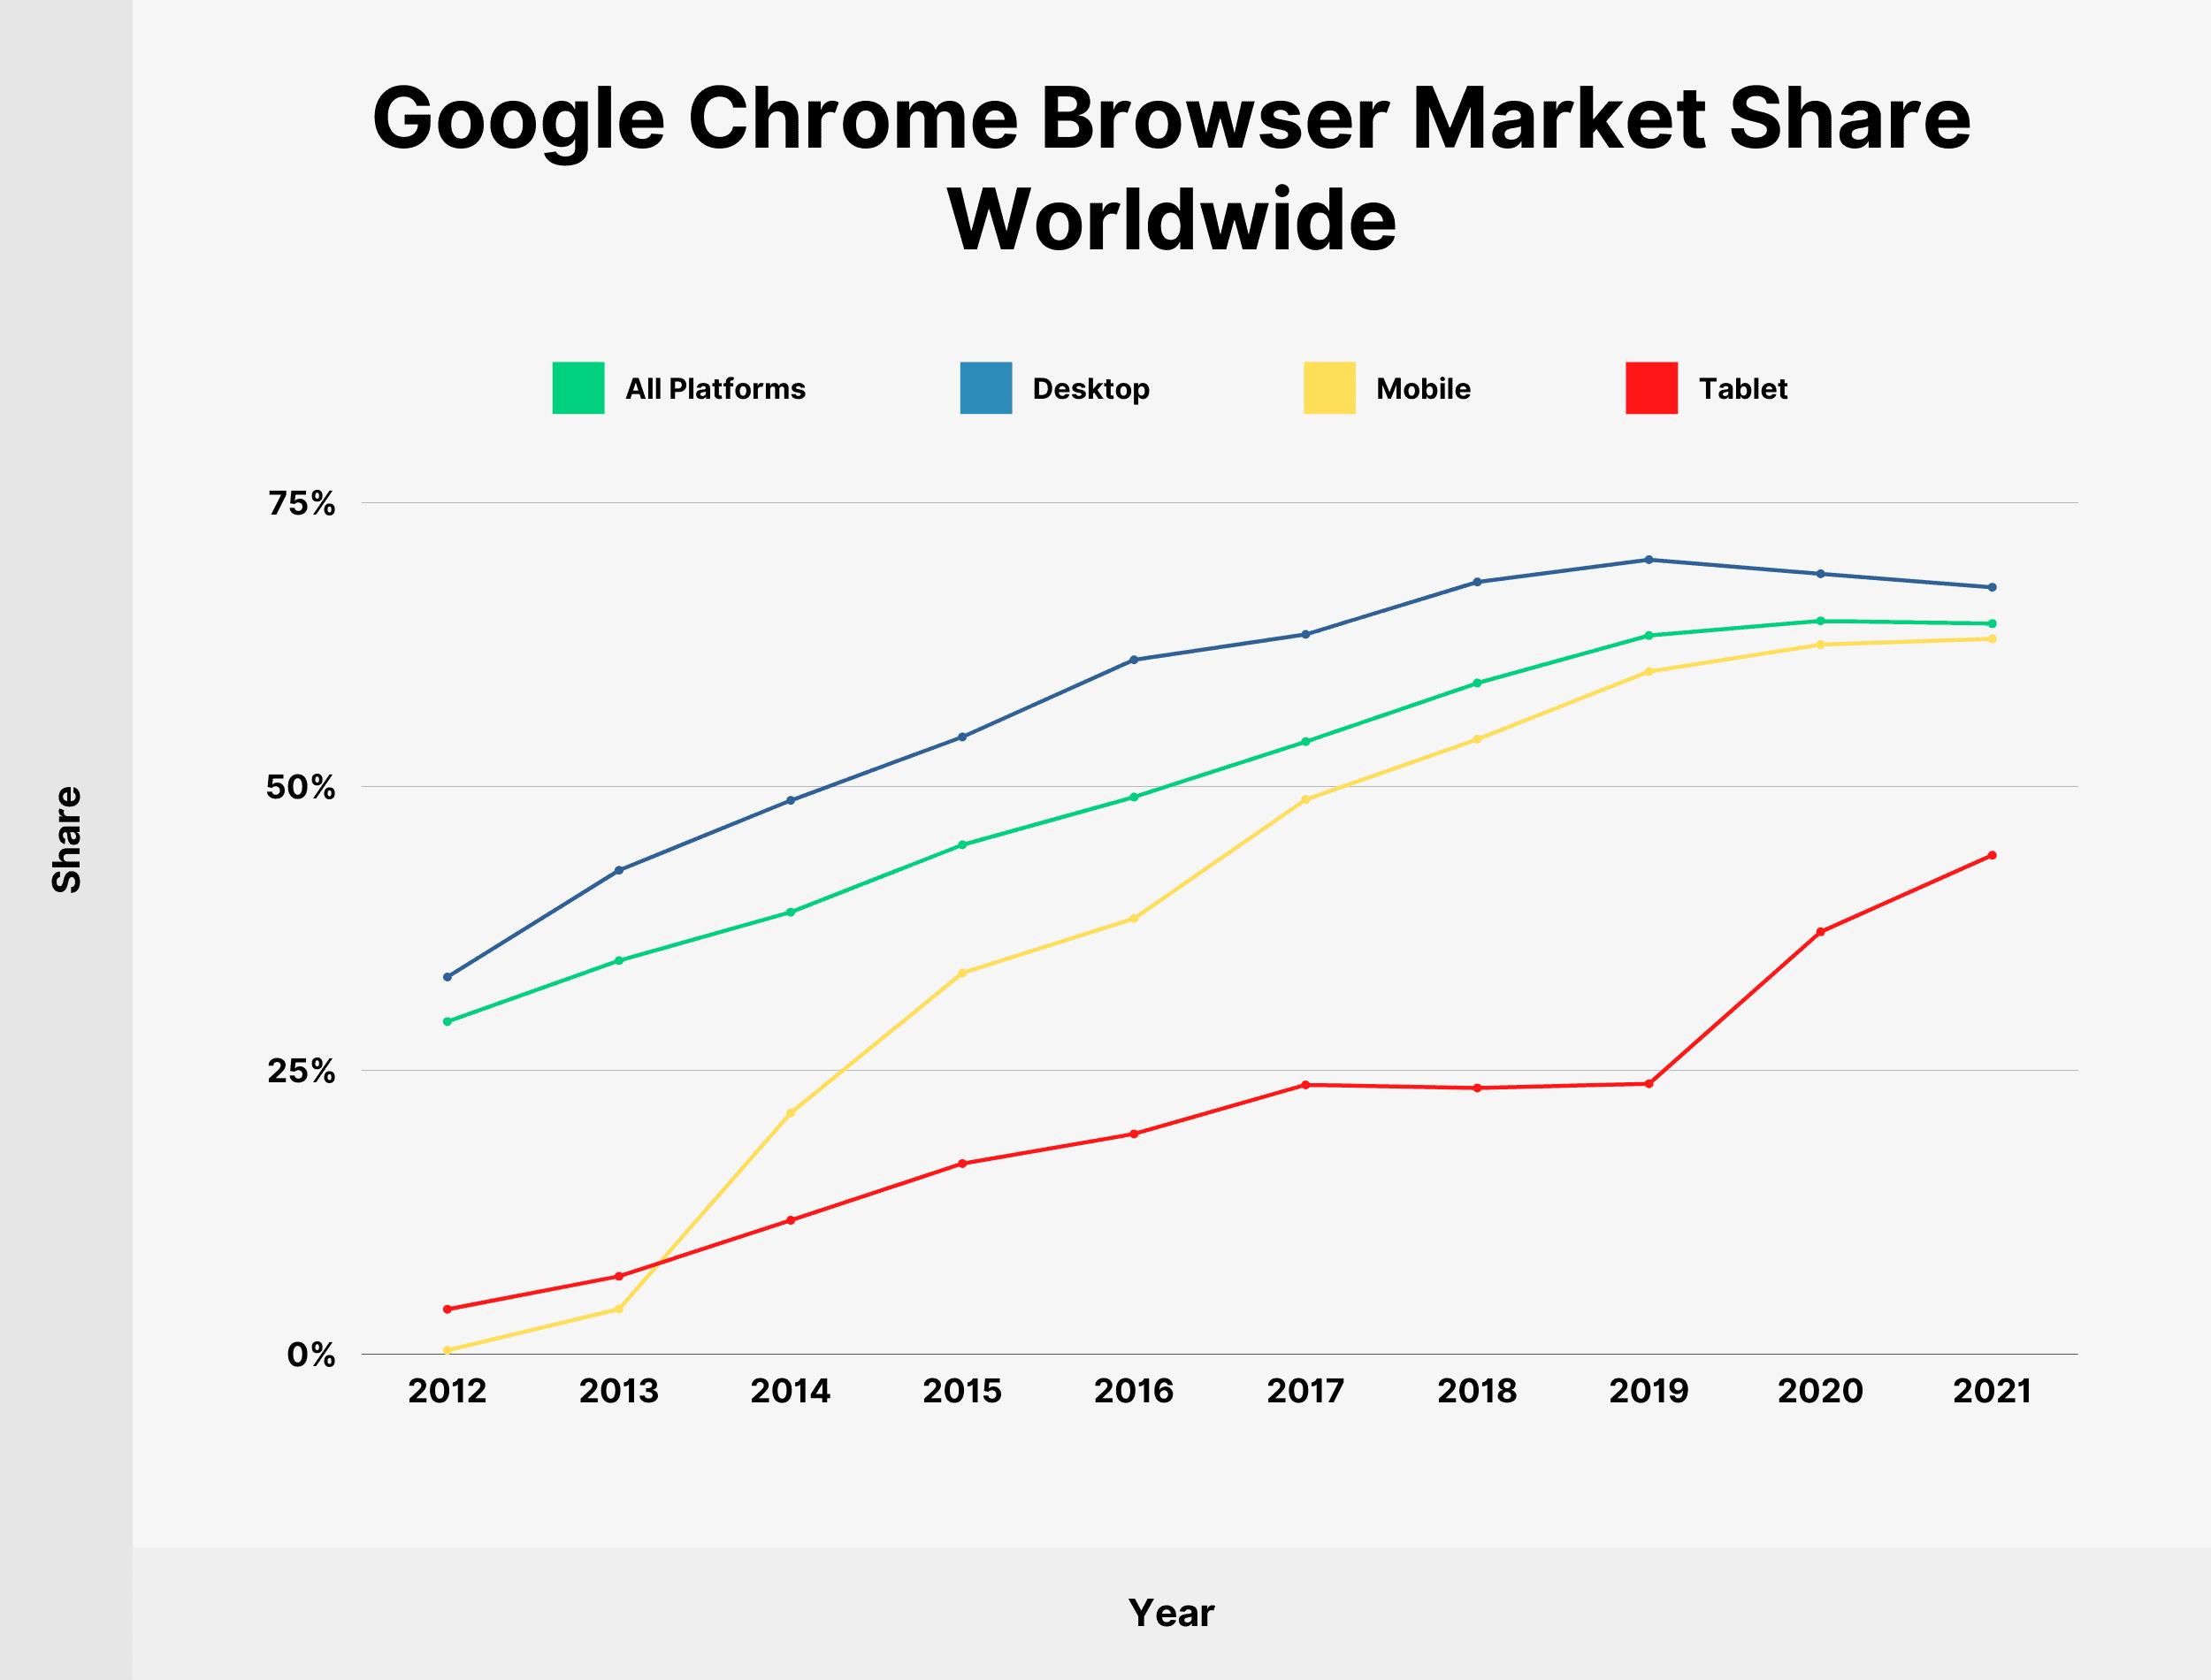 Google Chrome Browser Market Share Worldwide